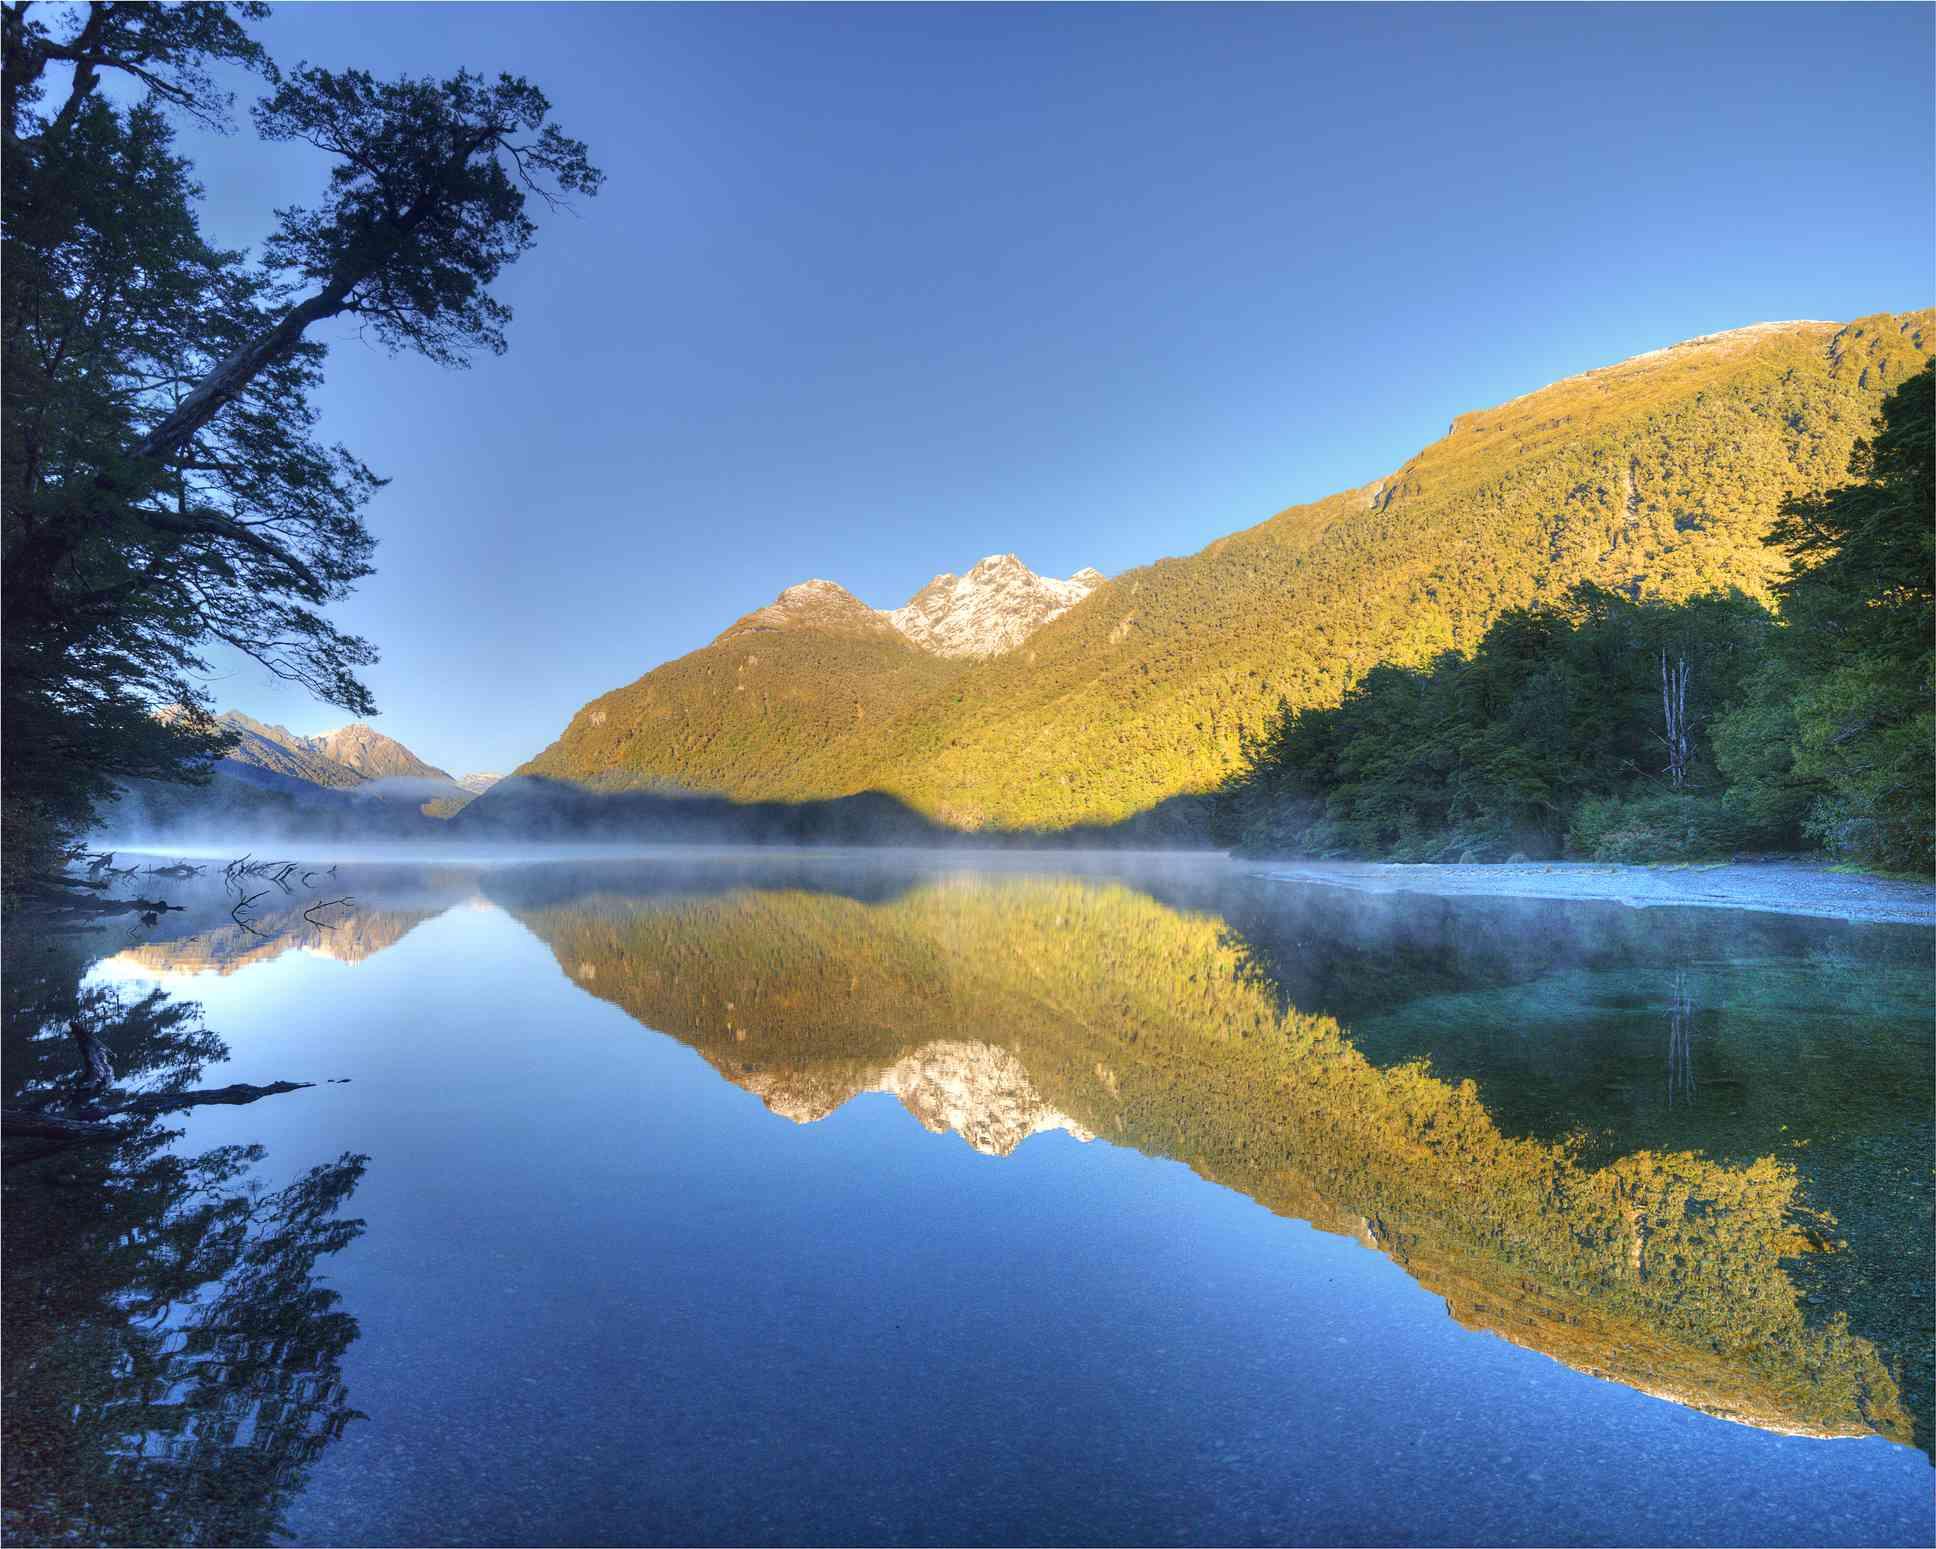 reflective lake and mountains